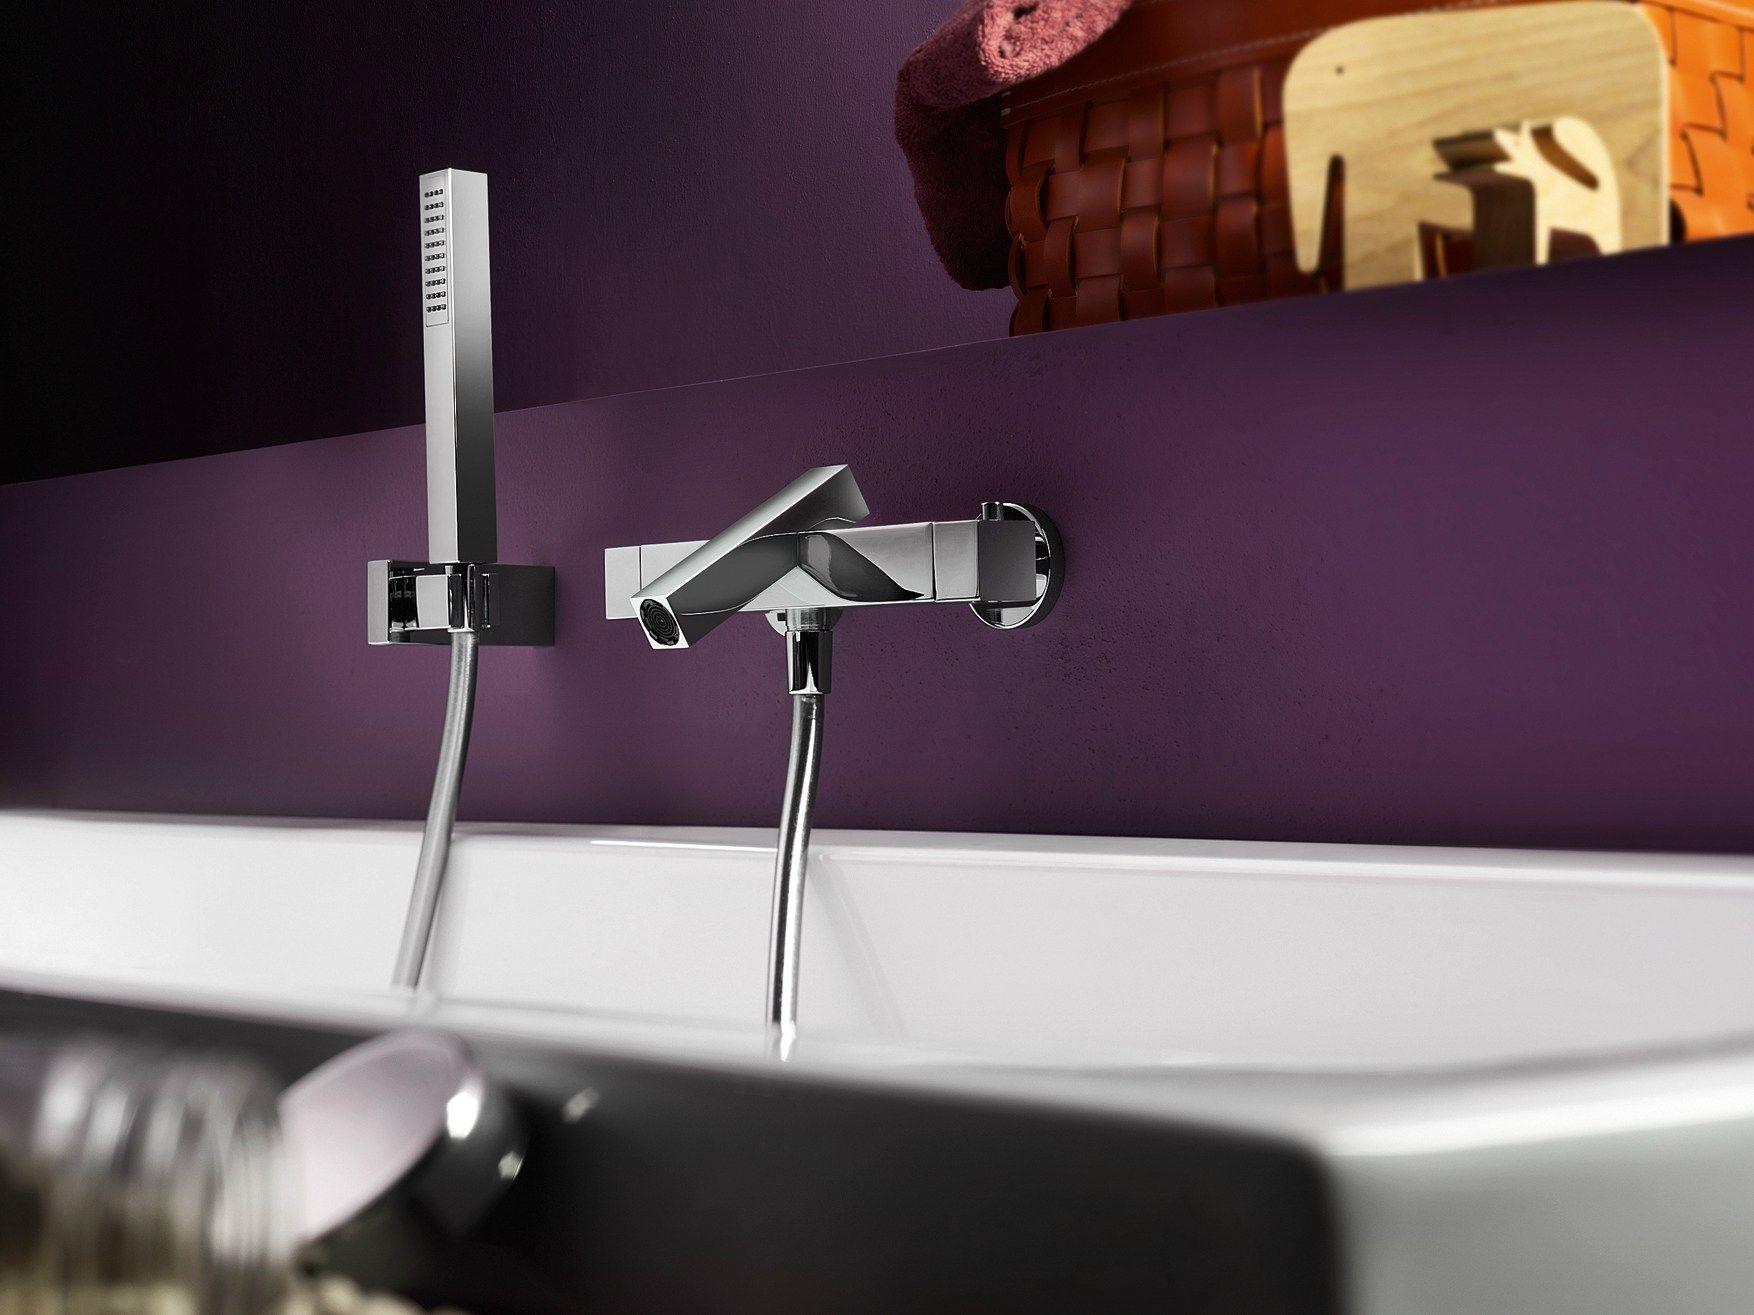 Deco Chambre Ton Beige : Robinet Mural Salle De Bain Pas Cherbain robinet salle robinet